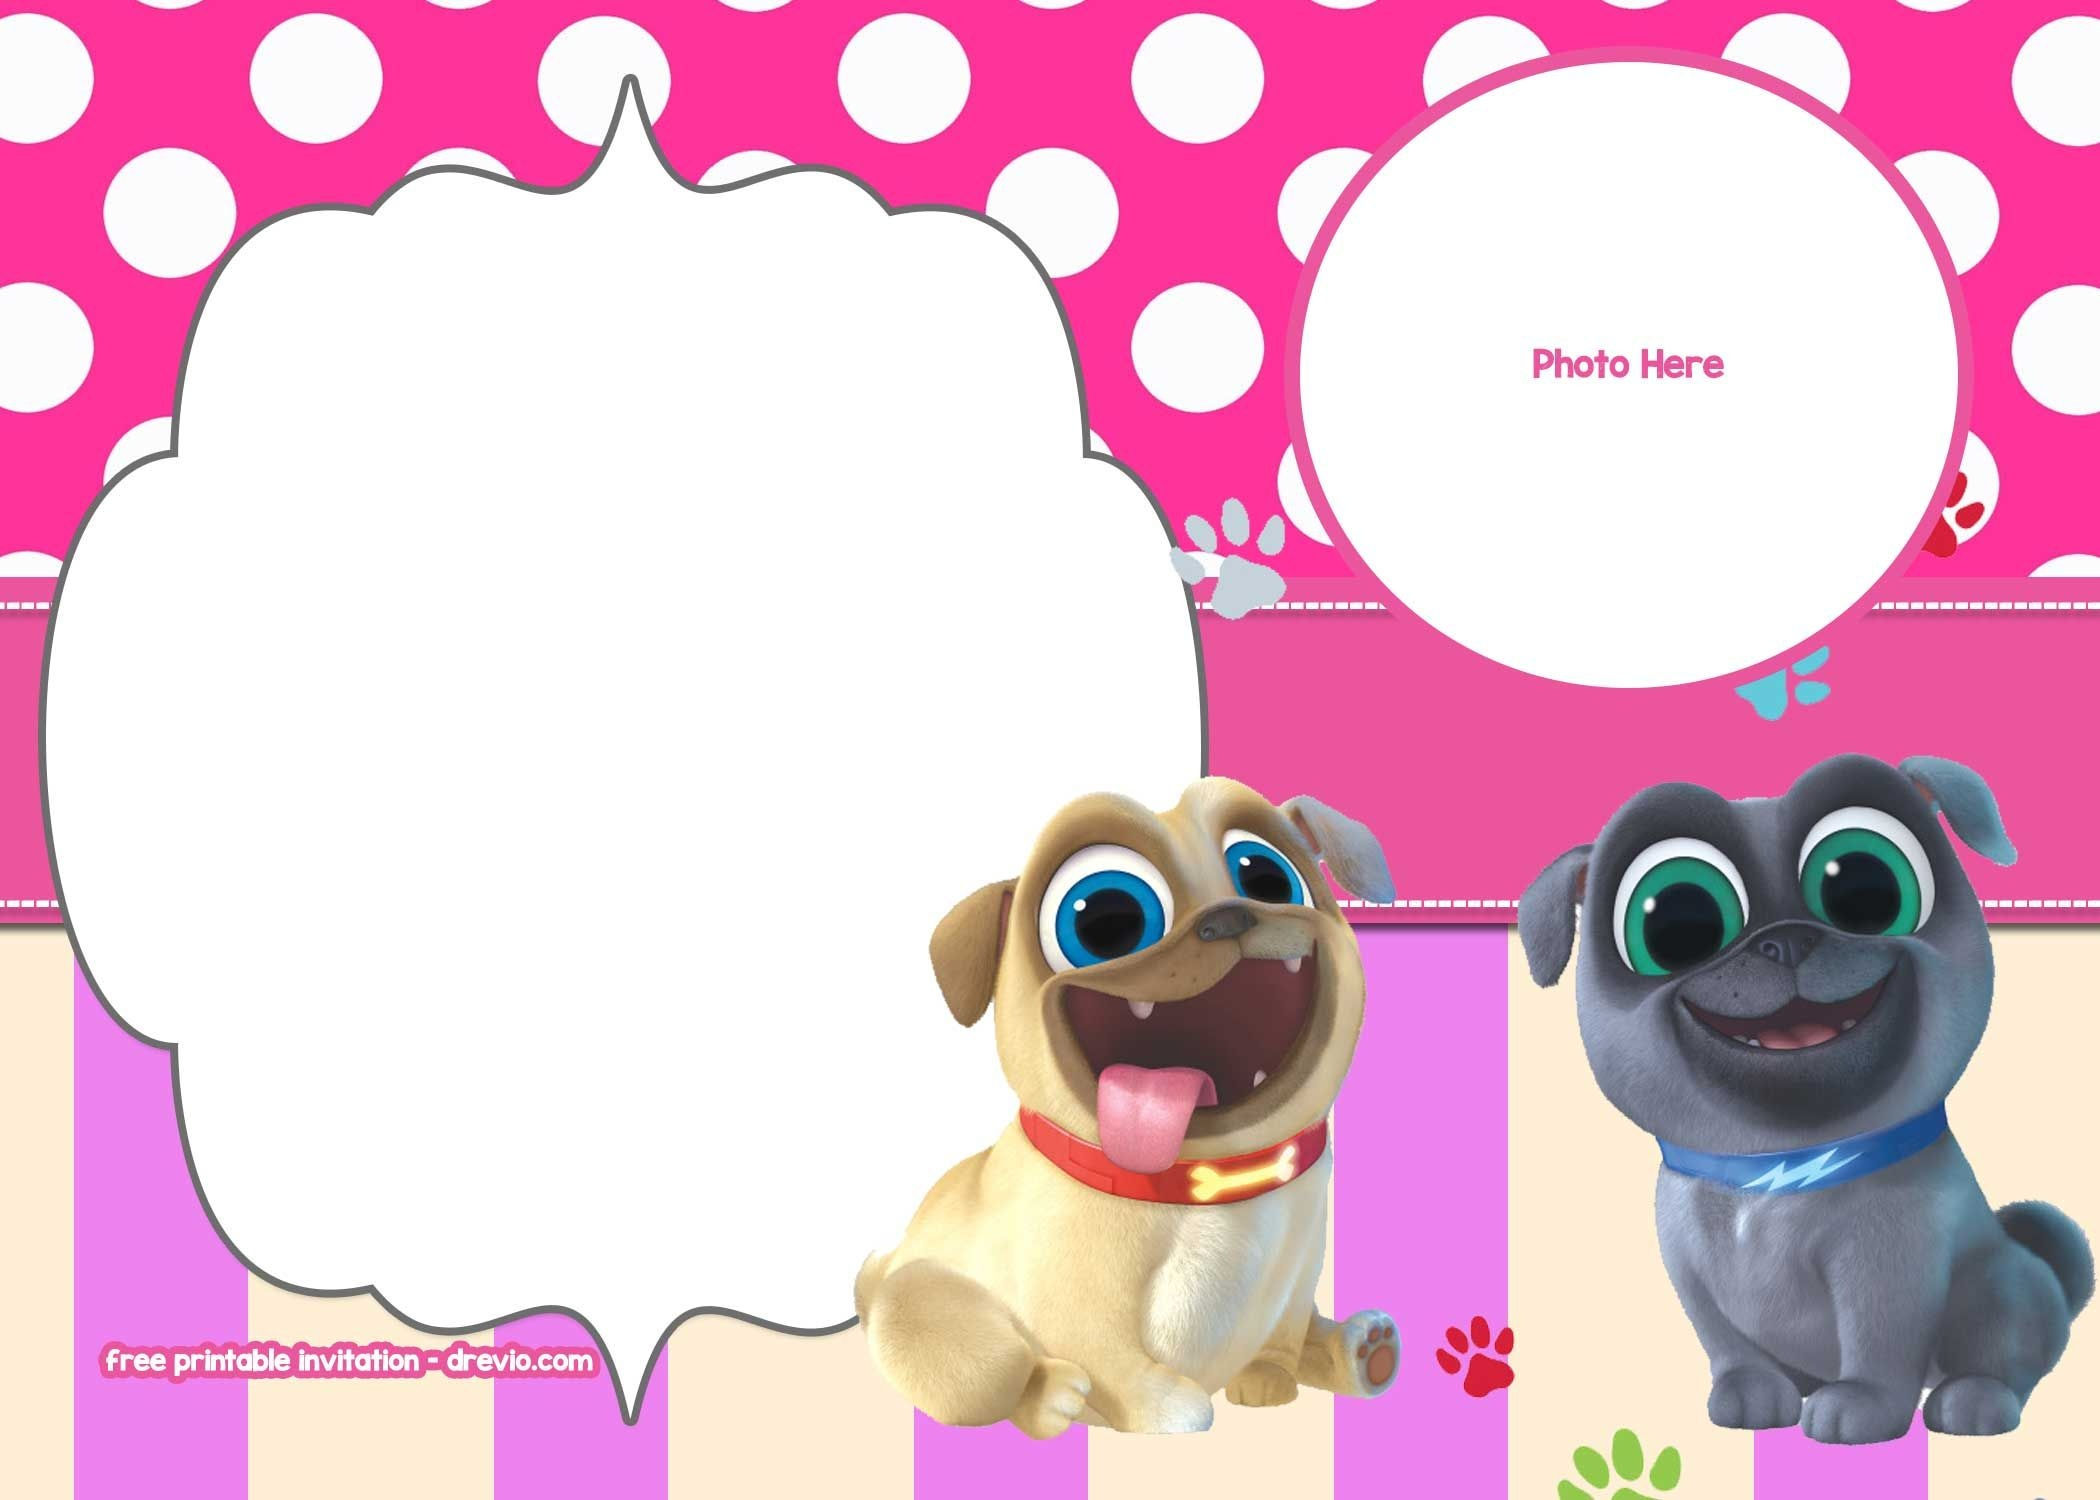 Free Disney Puppy Dog Pals Invitation Templates | Free Printable - Free Printable Puppy Dog Birthday Invitations